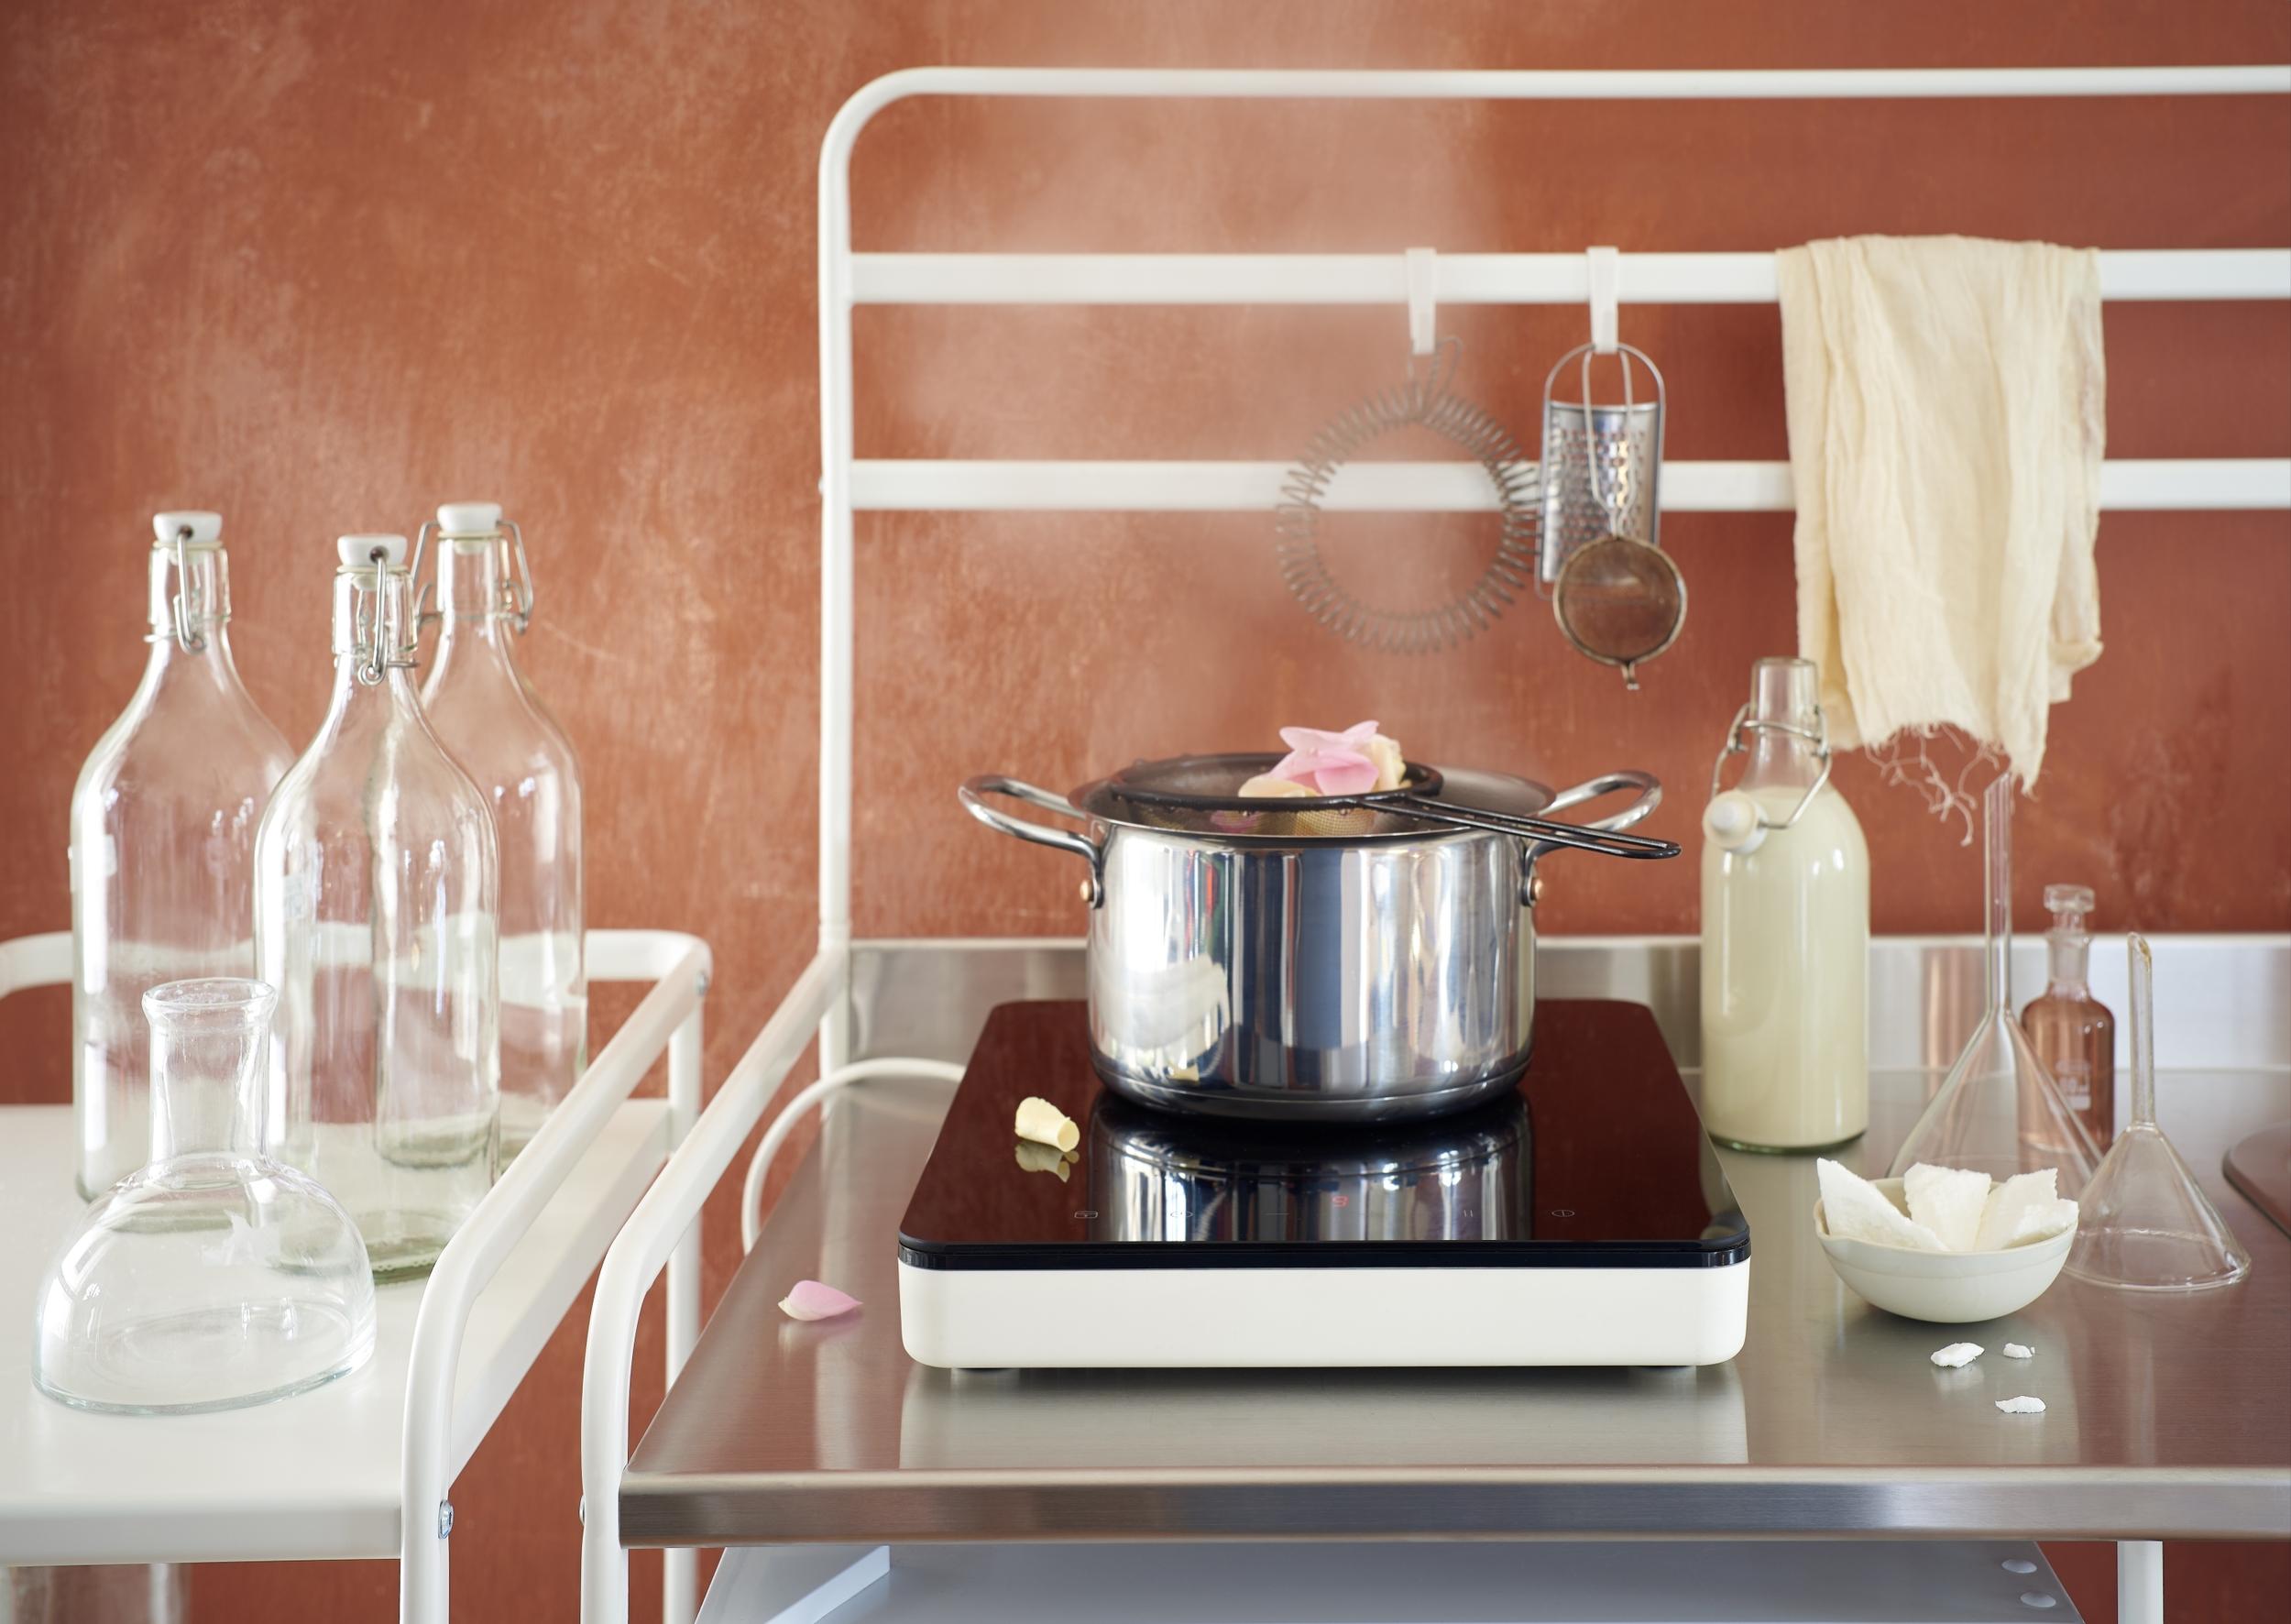 Tillreda - IKEA's  new portable induction cooktop.